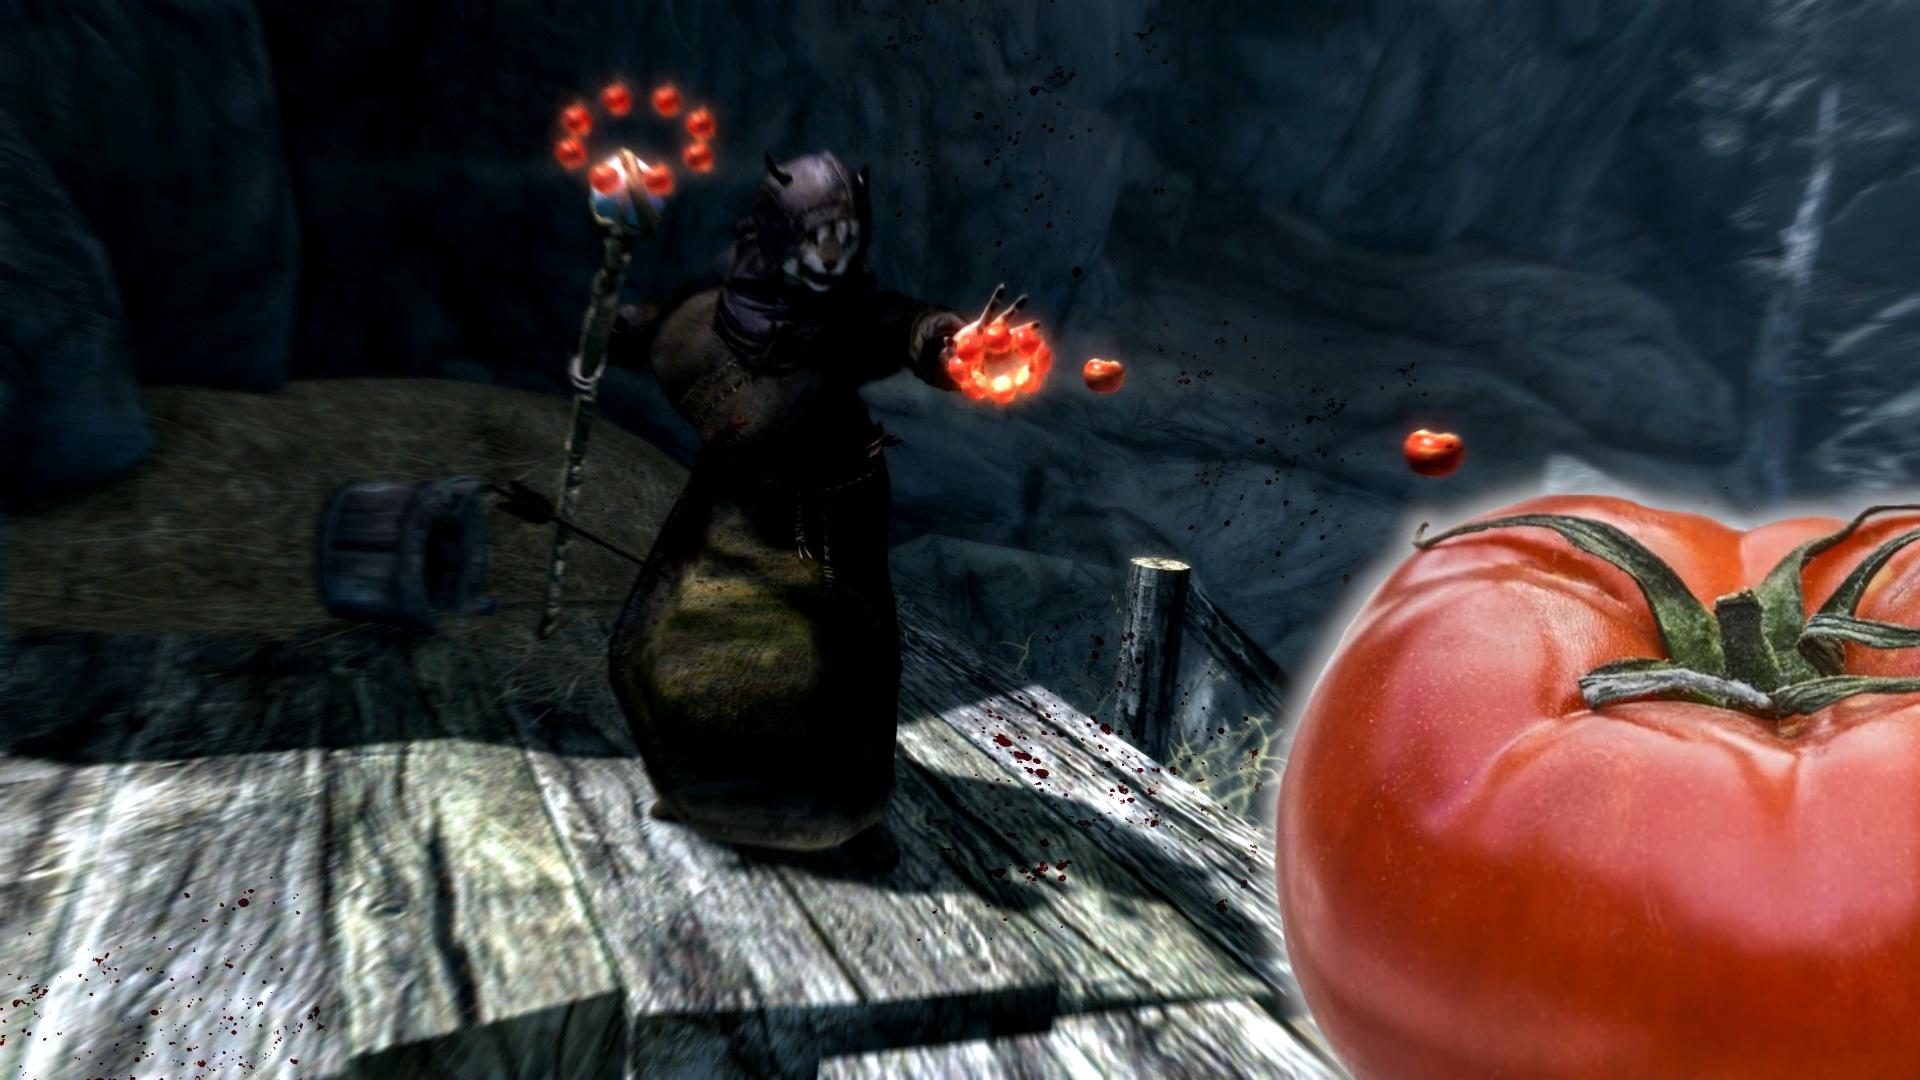 How a tomato mod turns Skyrim upside down